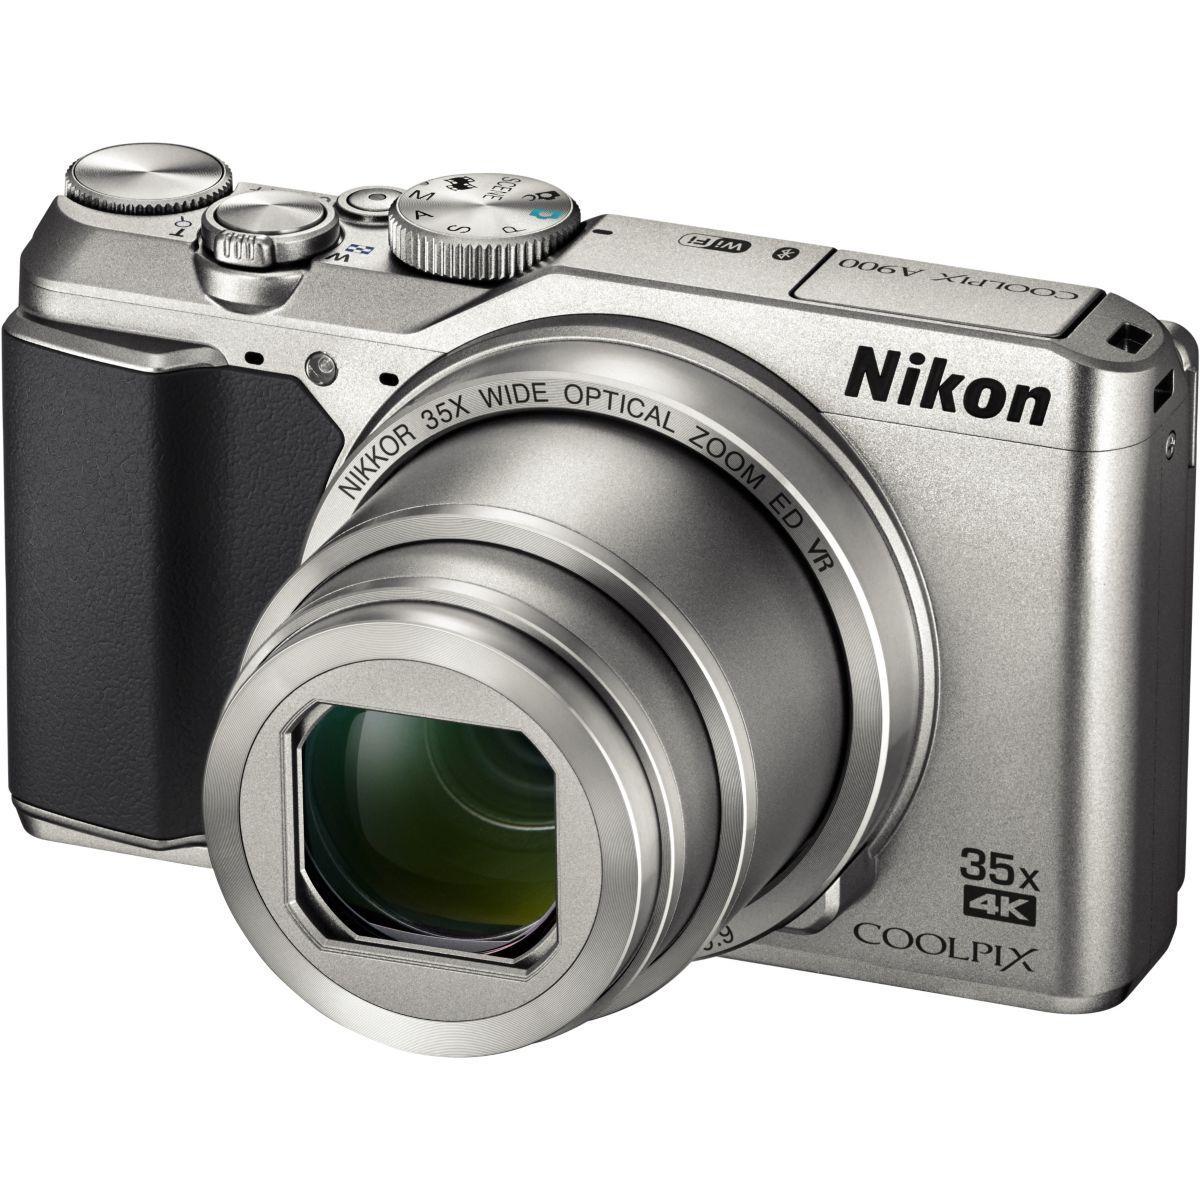 Appareil photo compact nikon coolpix a900 silver (photo)